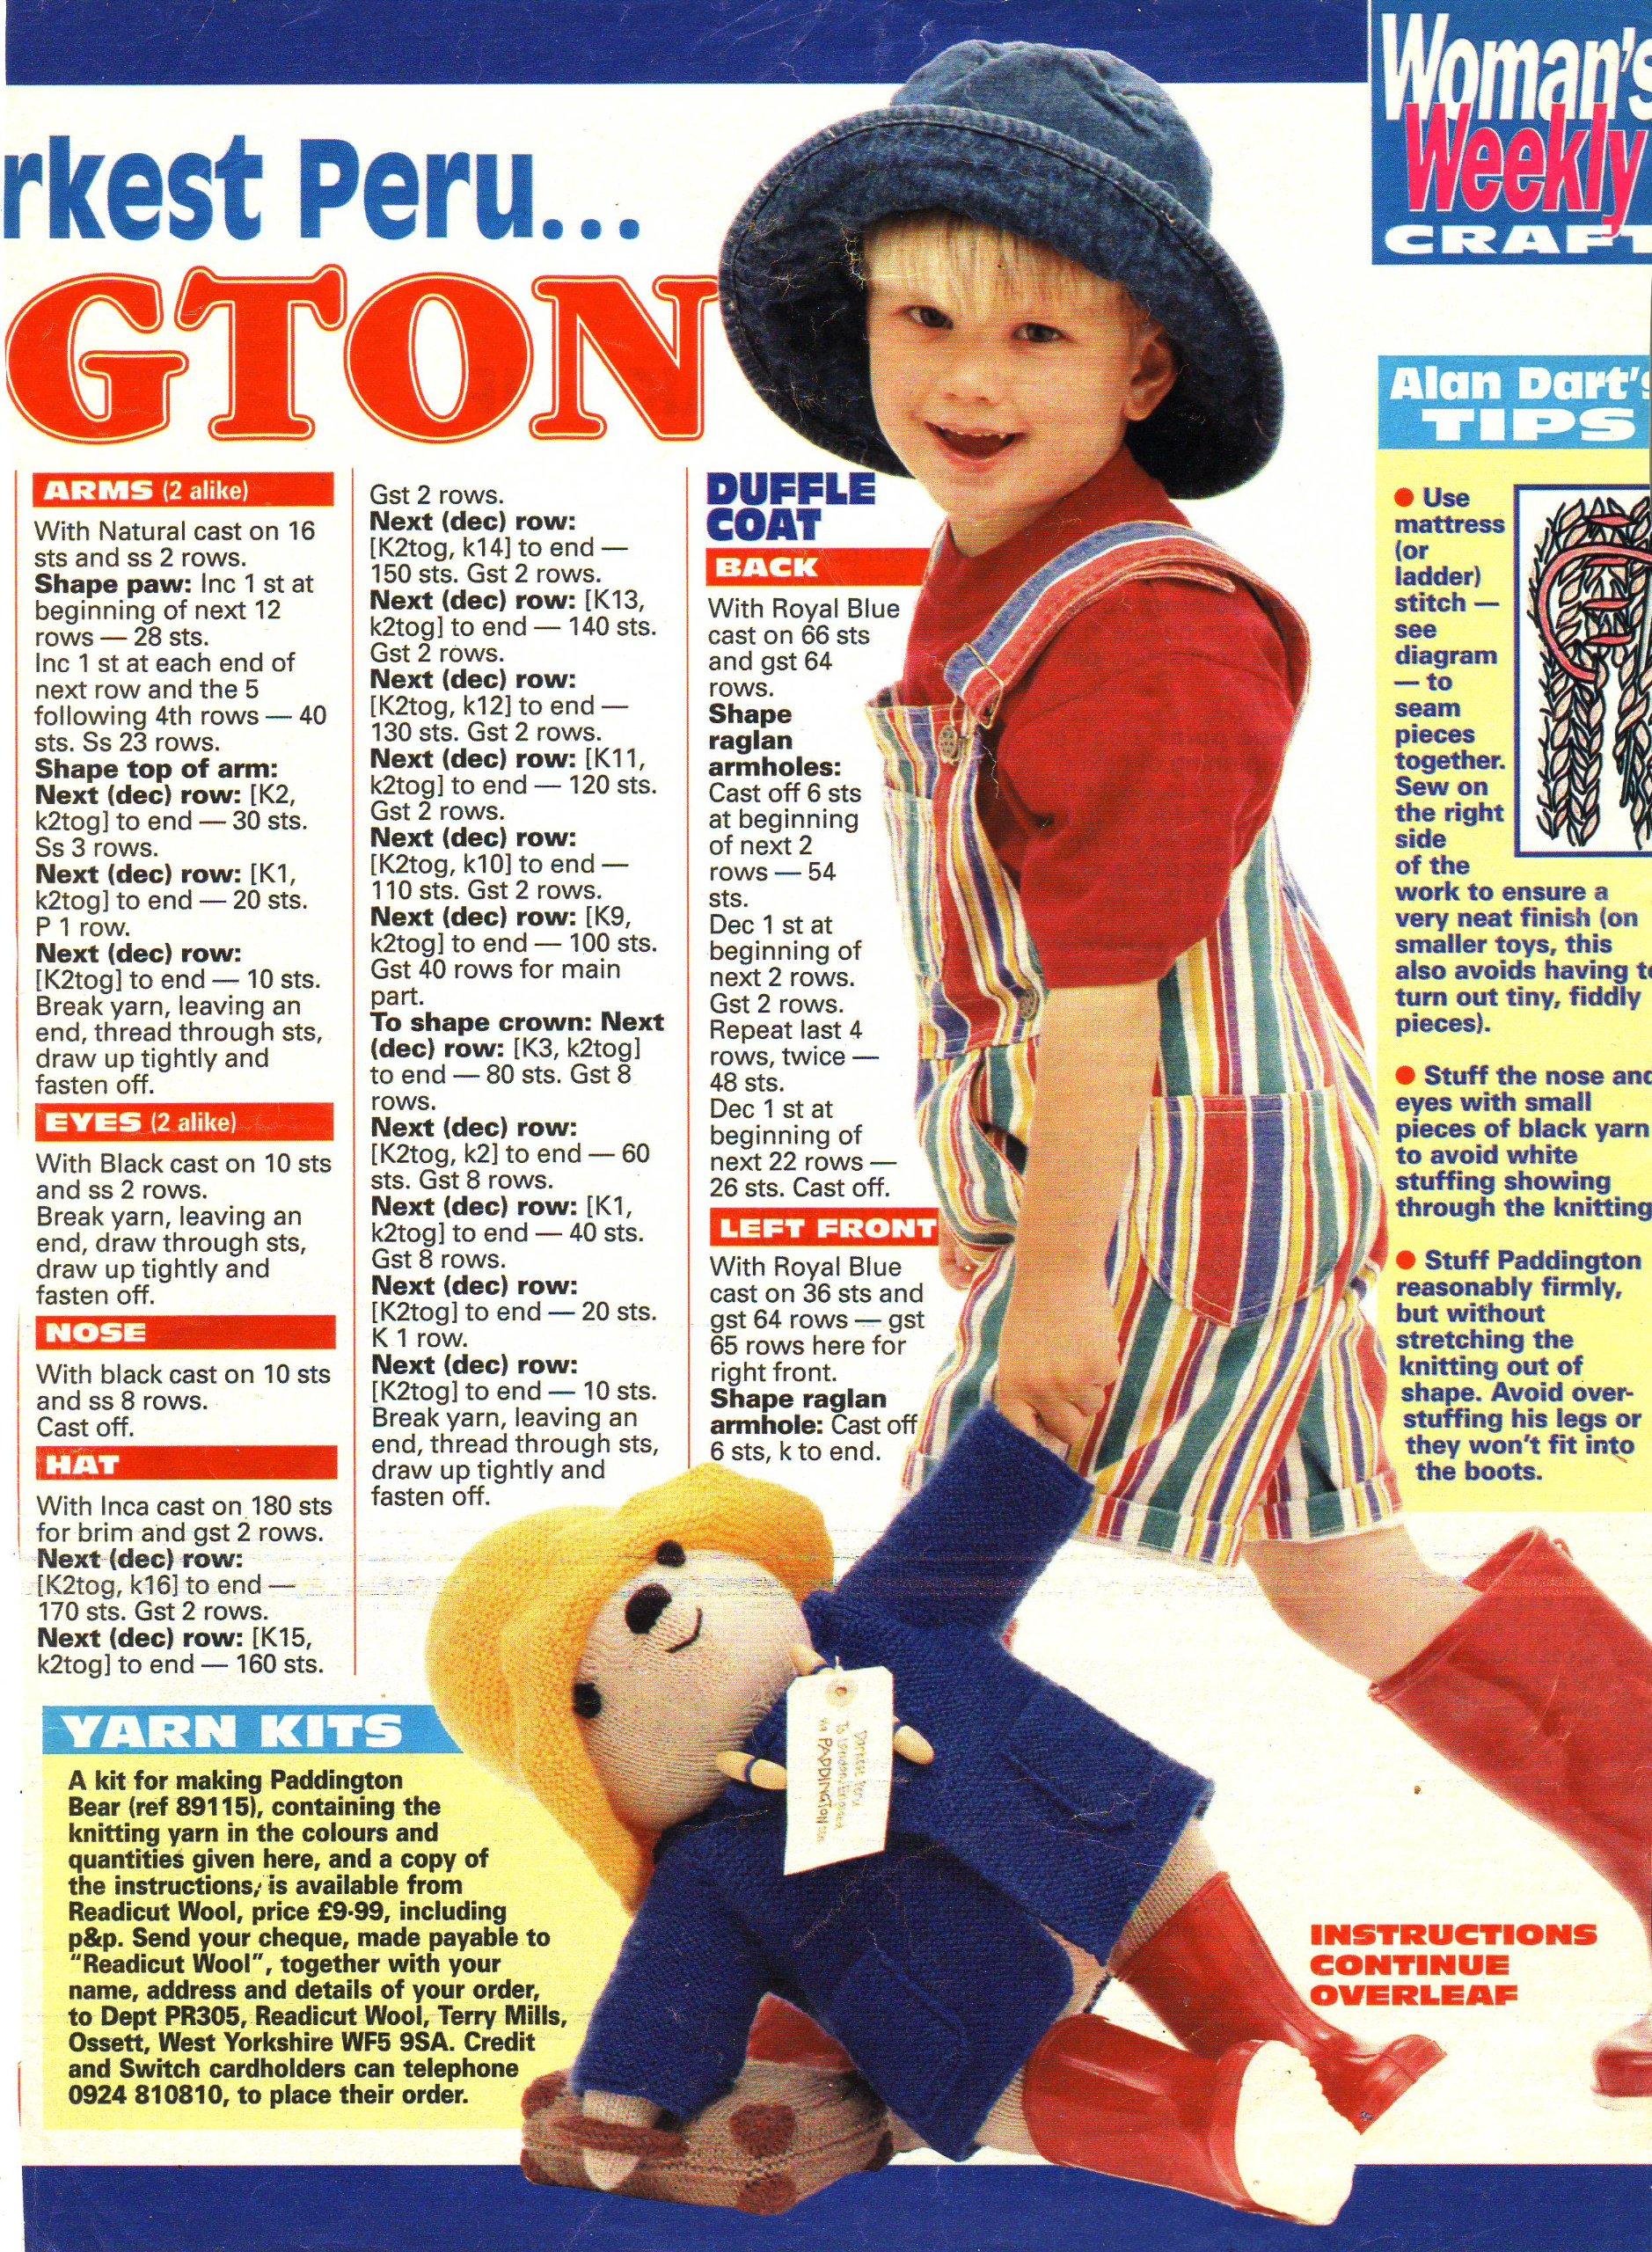 Paddington Bear Toy by Alan Dart Knitting Pattern Measurement